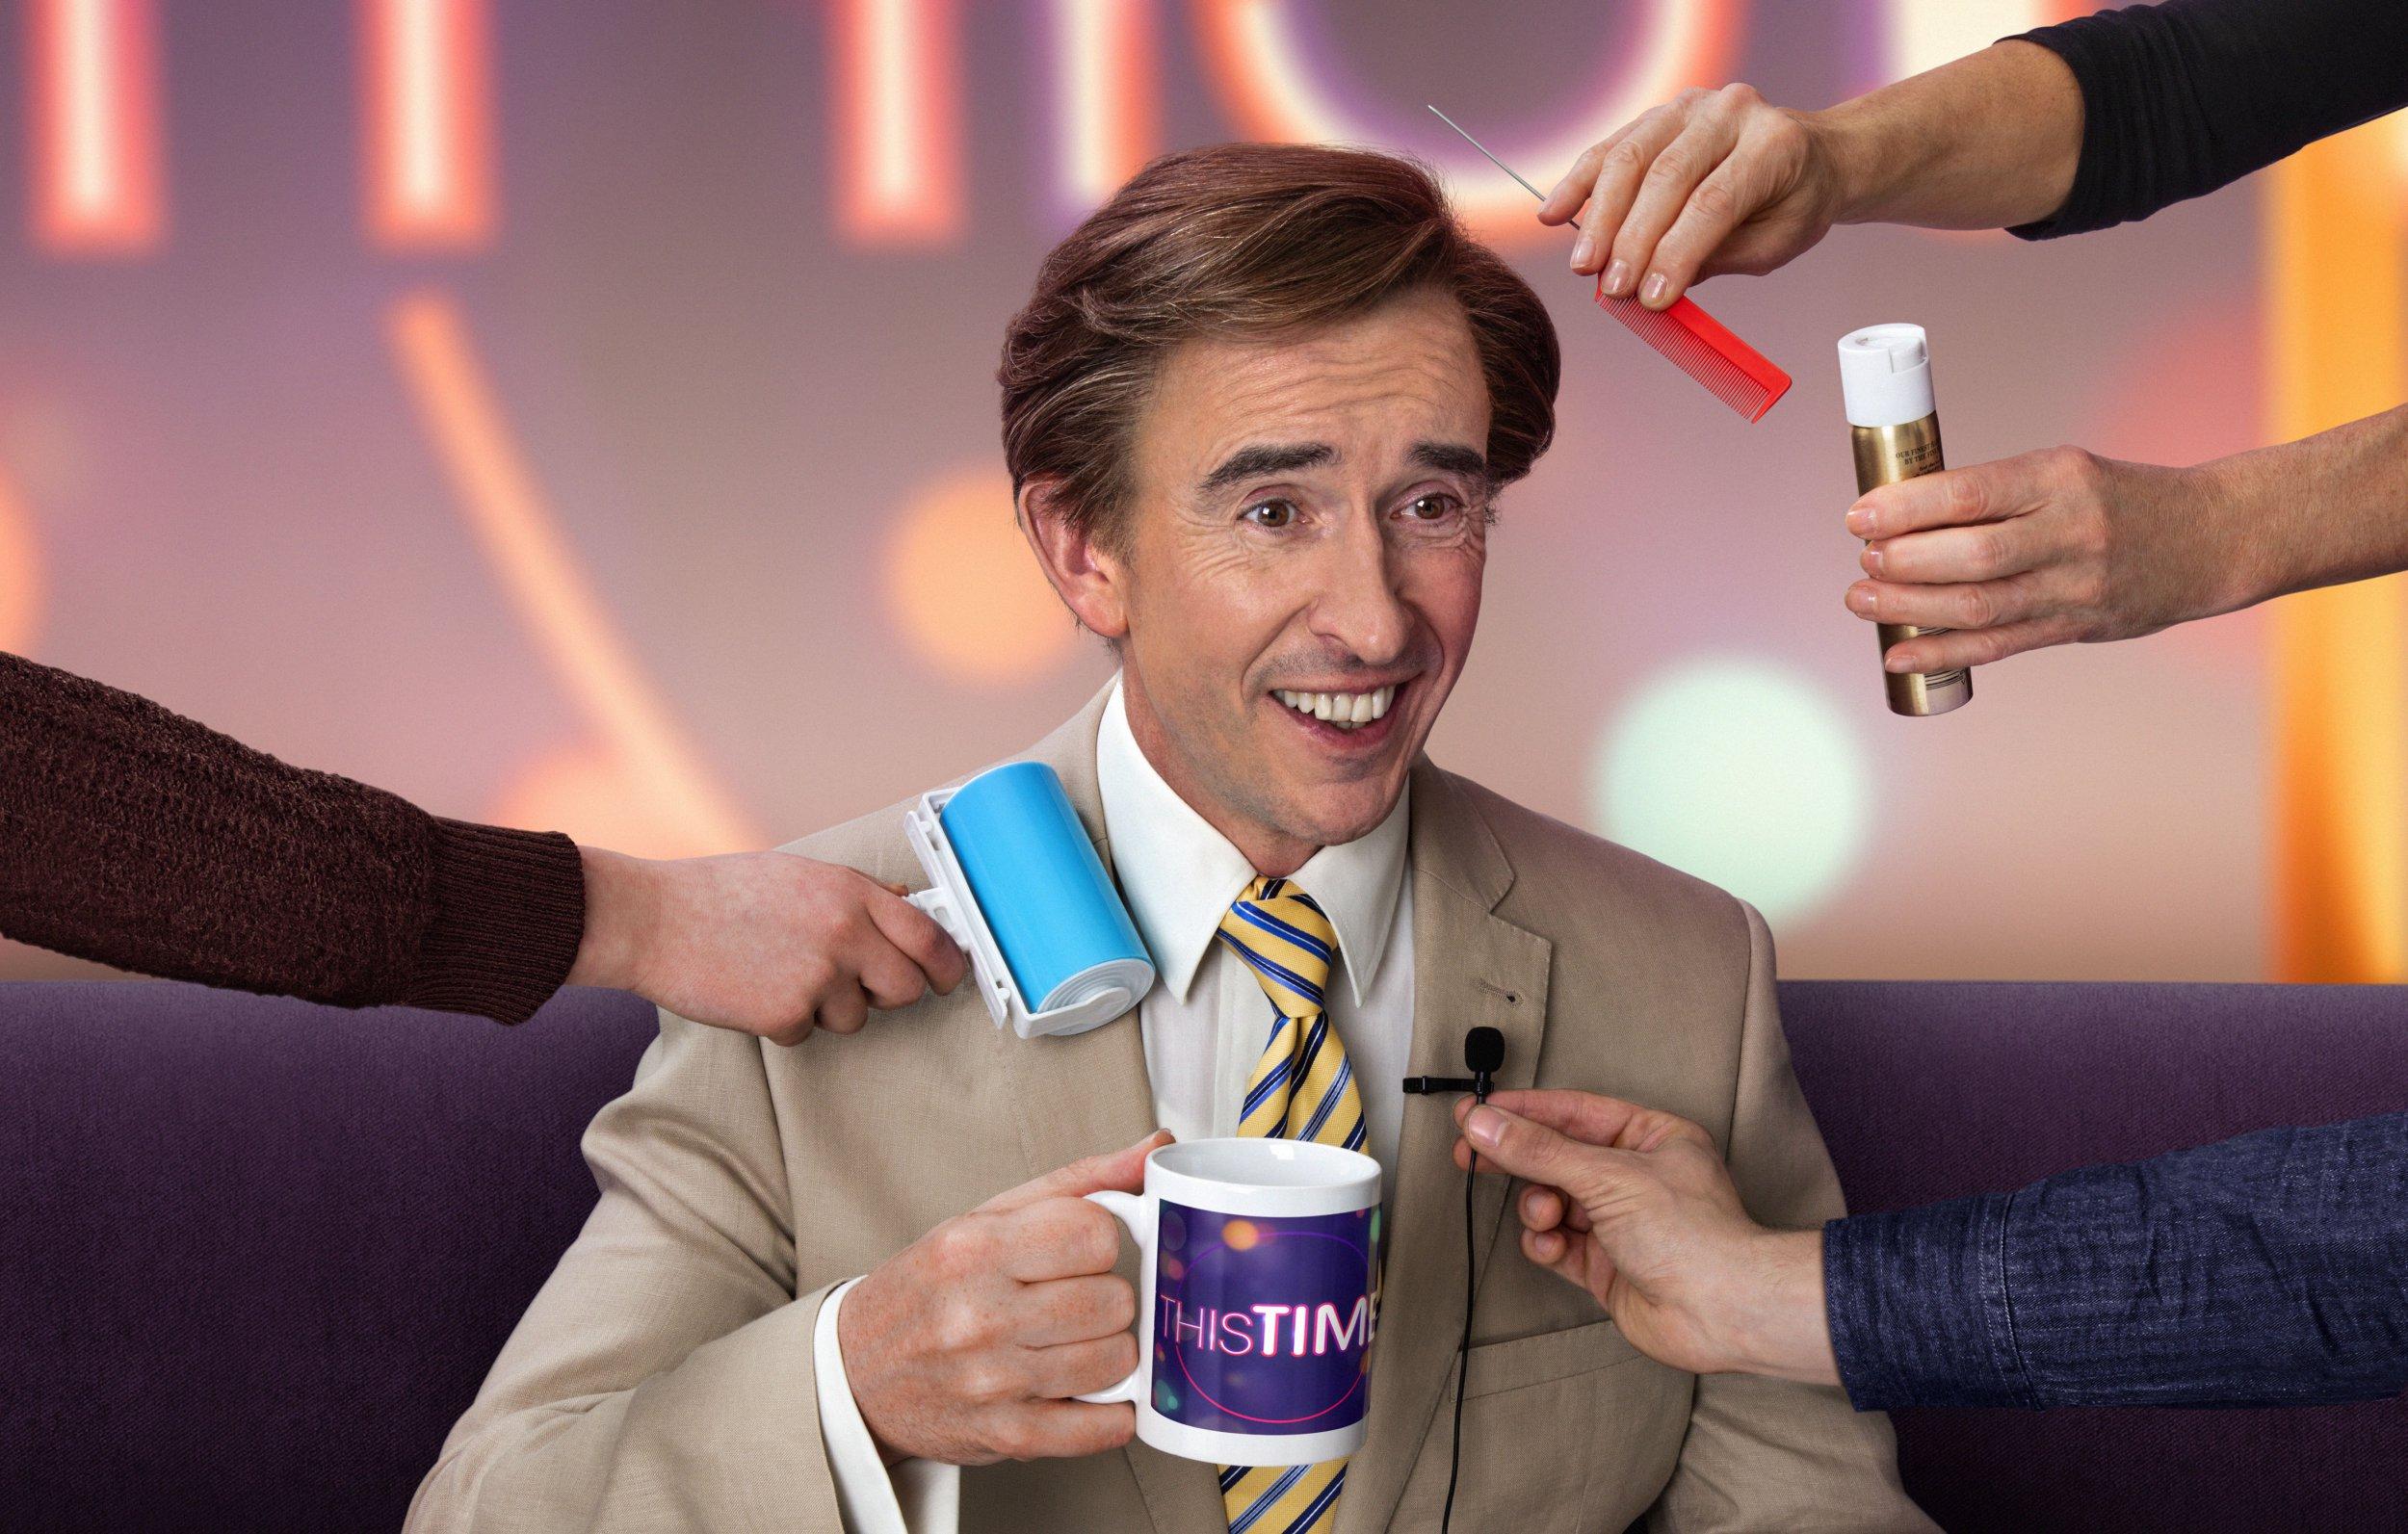 The nation has gone Alan Partridge mad as British comedians celebrate 'genius' return